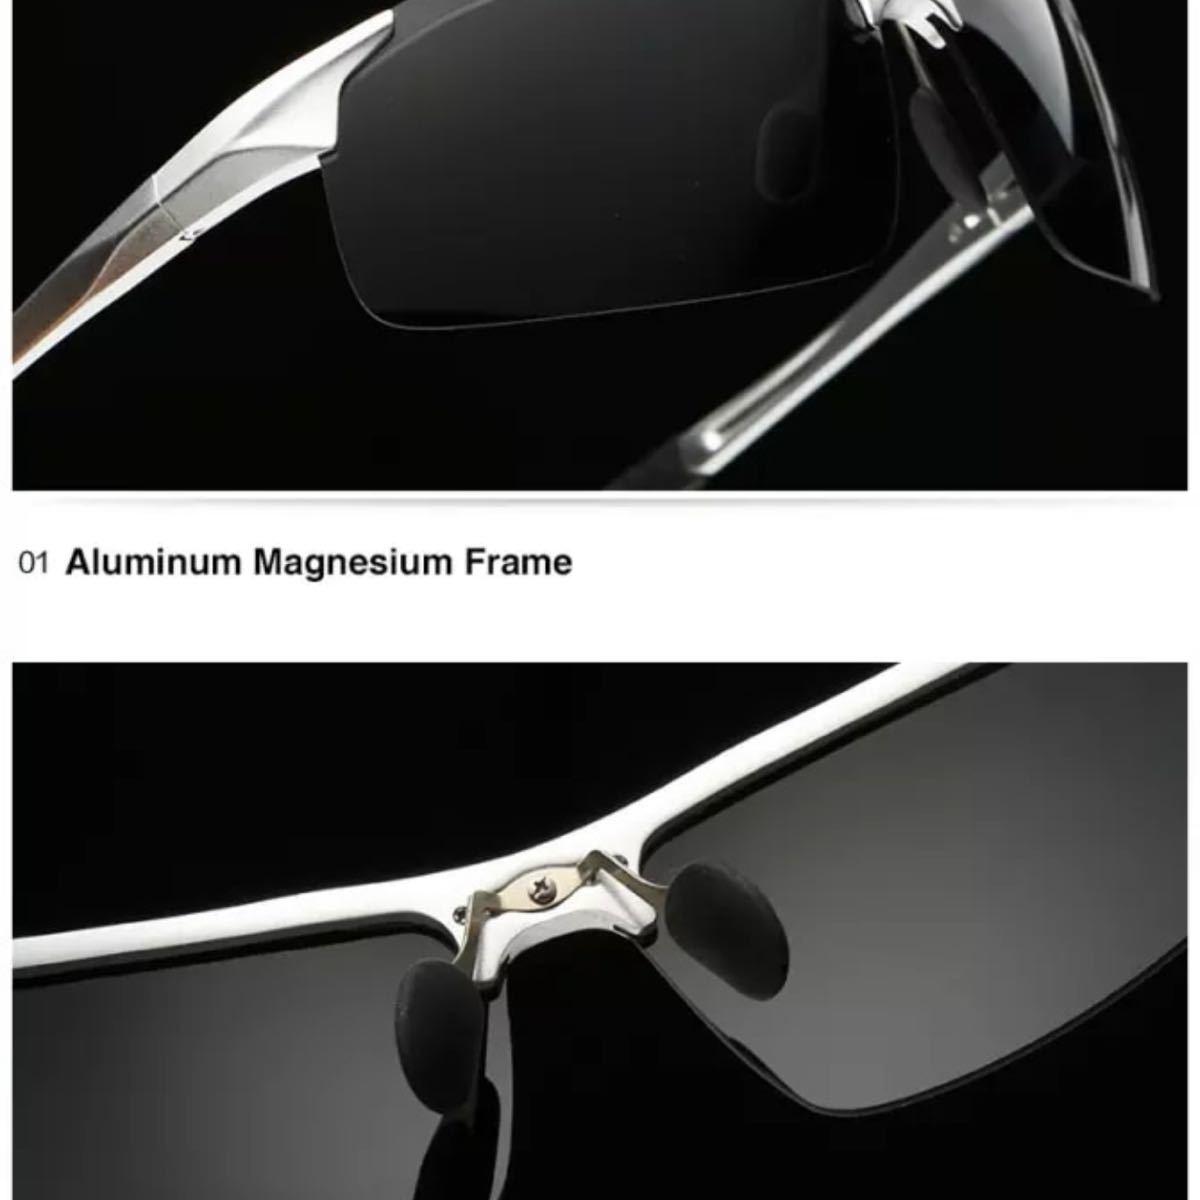 AORON スポーツ偏光サングラス グリーンミラーレンズ グレーアルミニウム合金フレーム